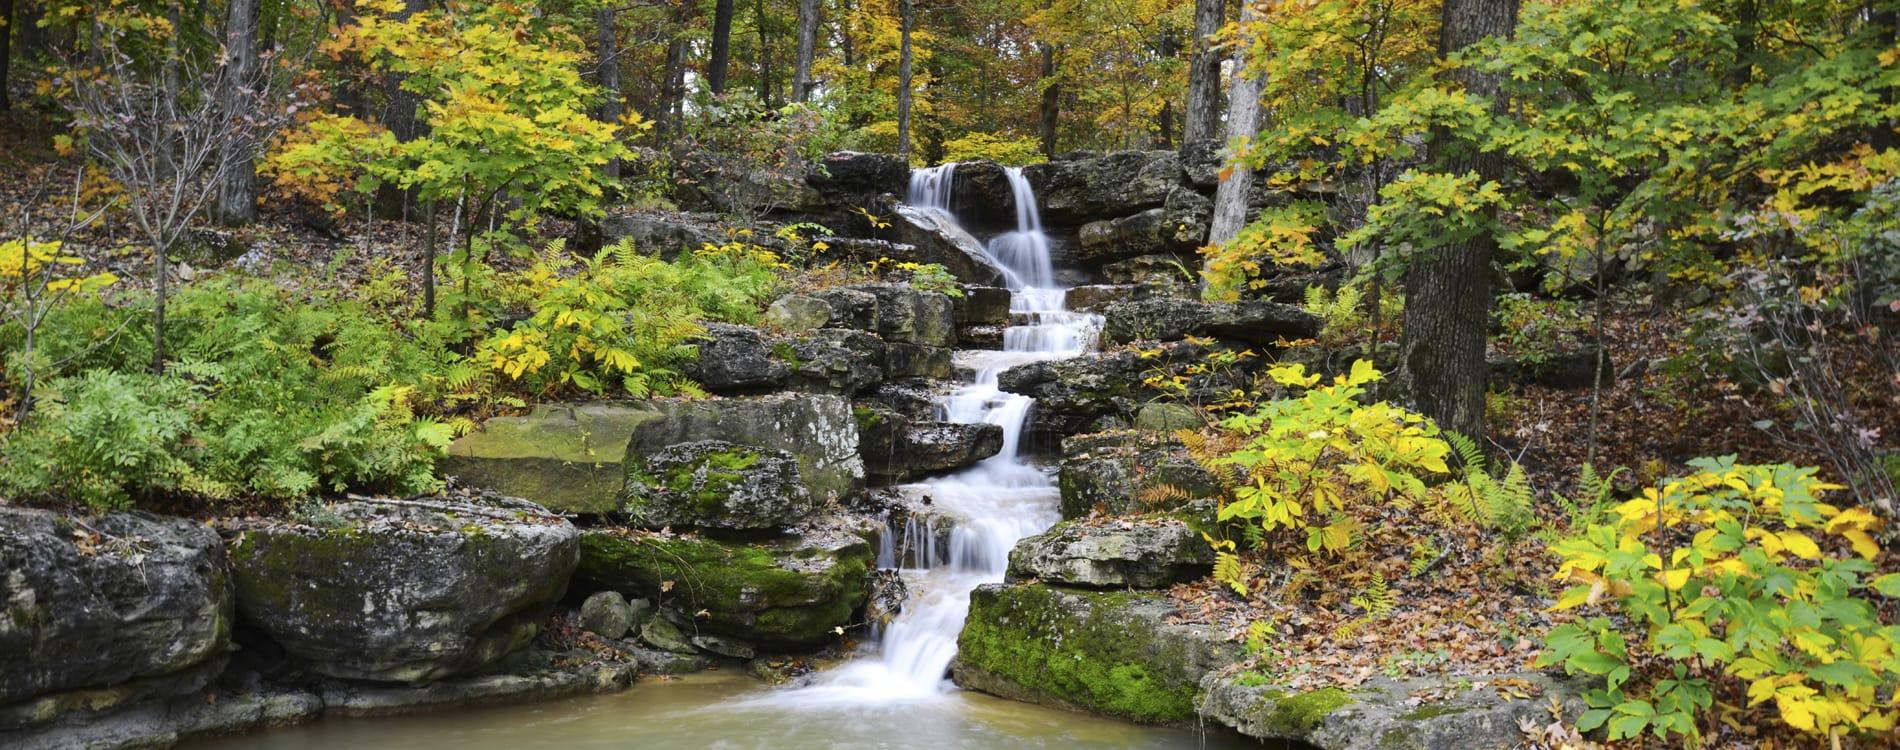 Branson, MO - Waterfall